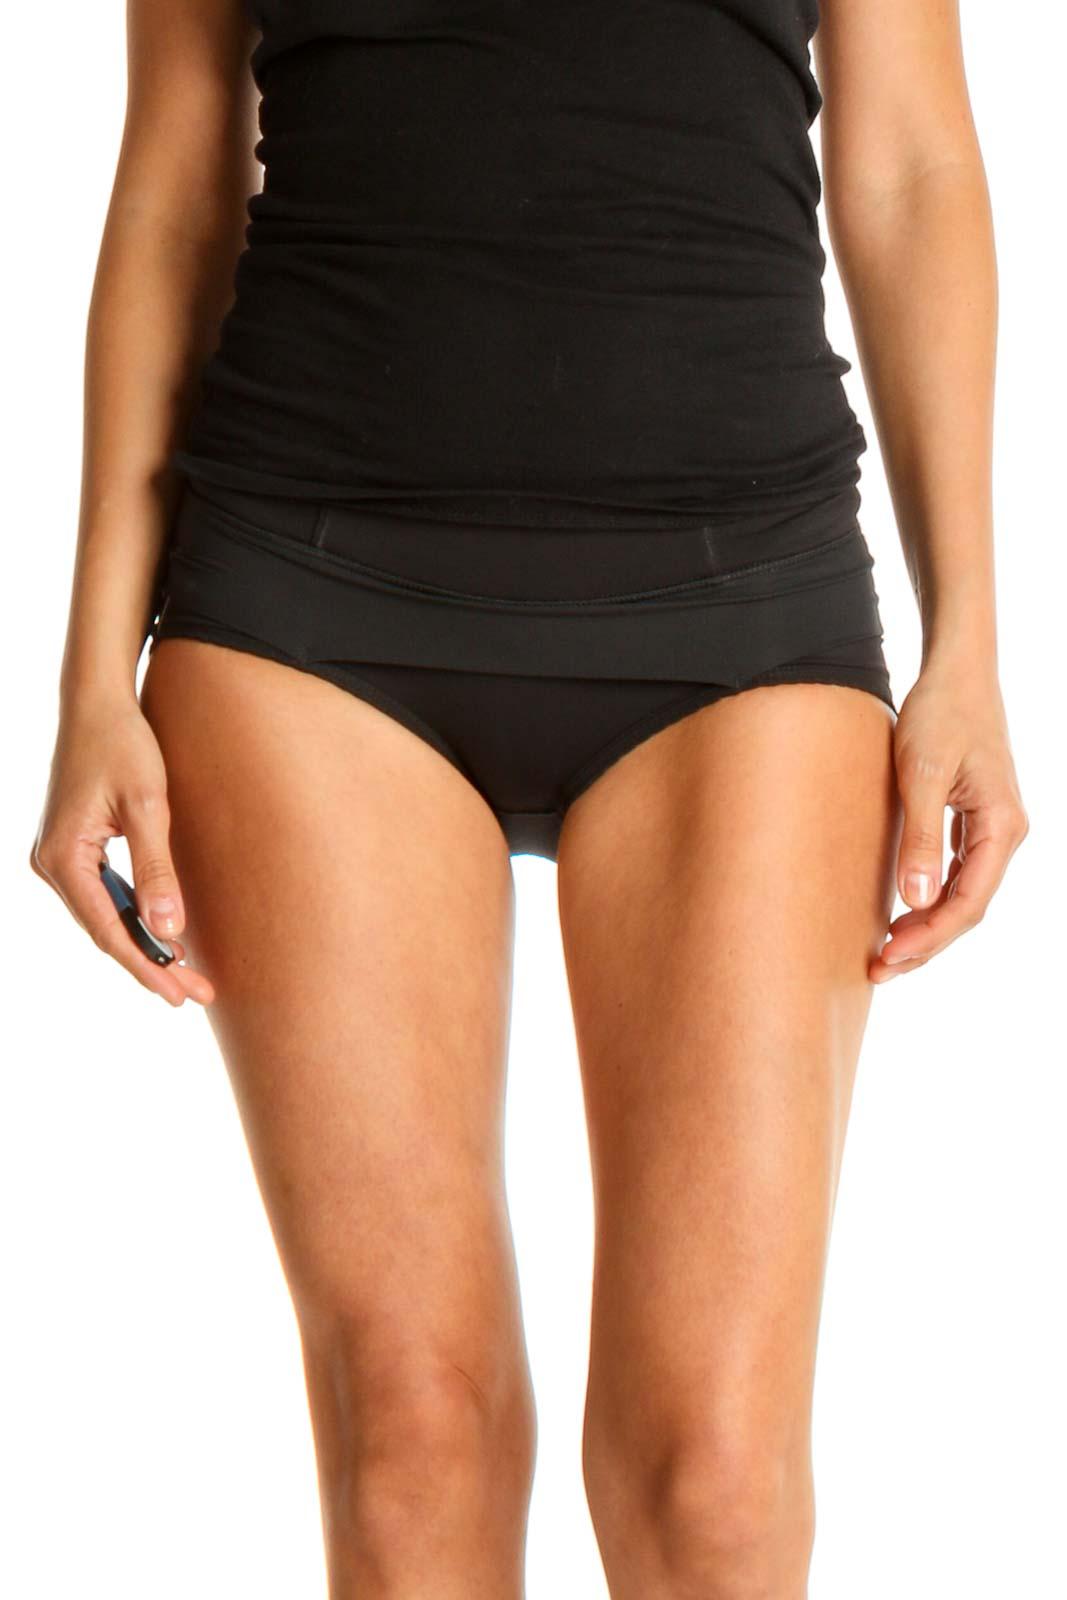 Black Activewear Bottoms Front